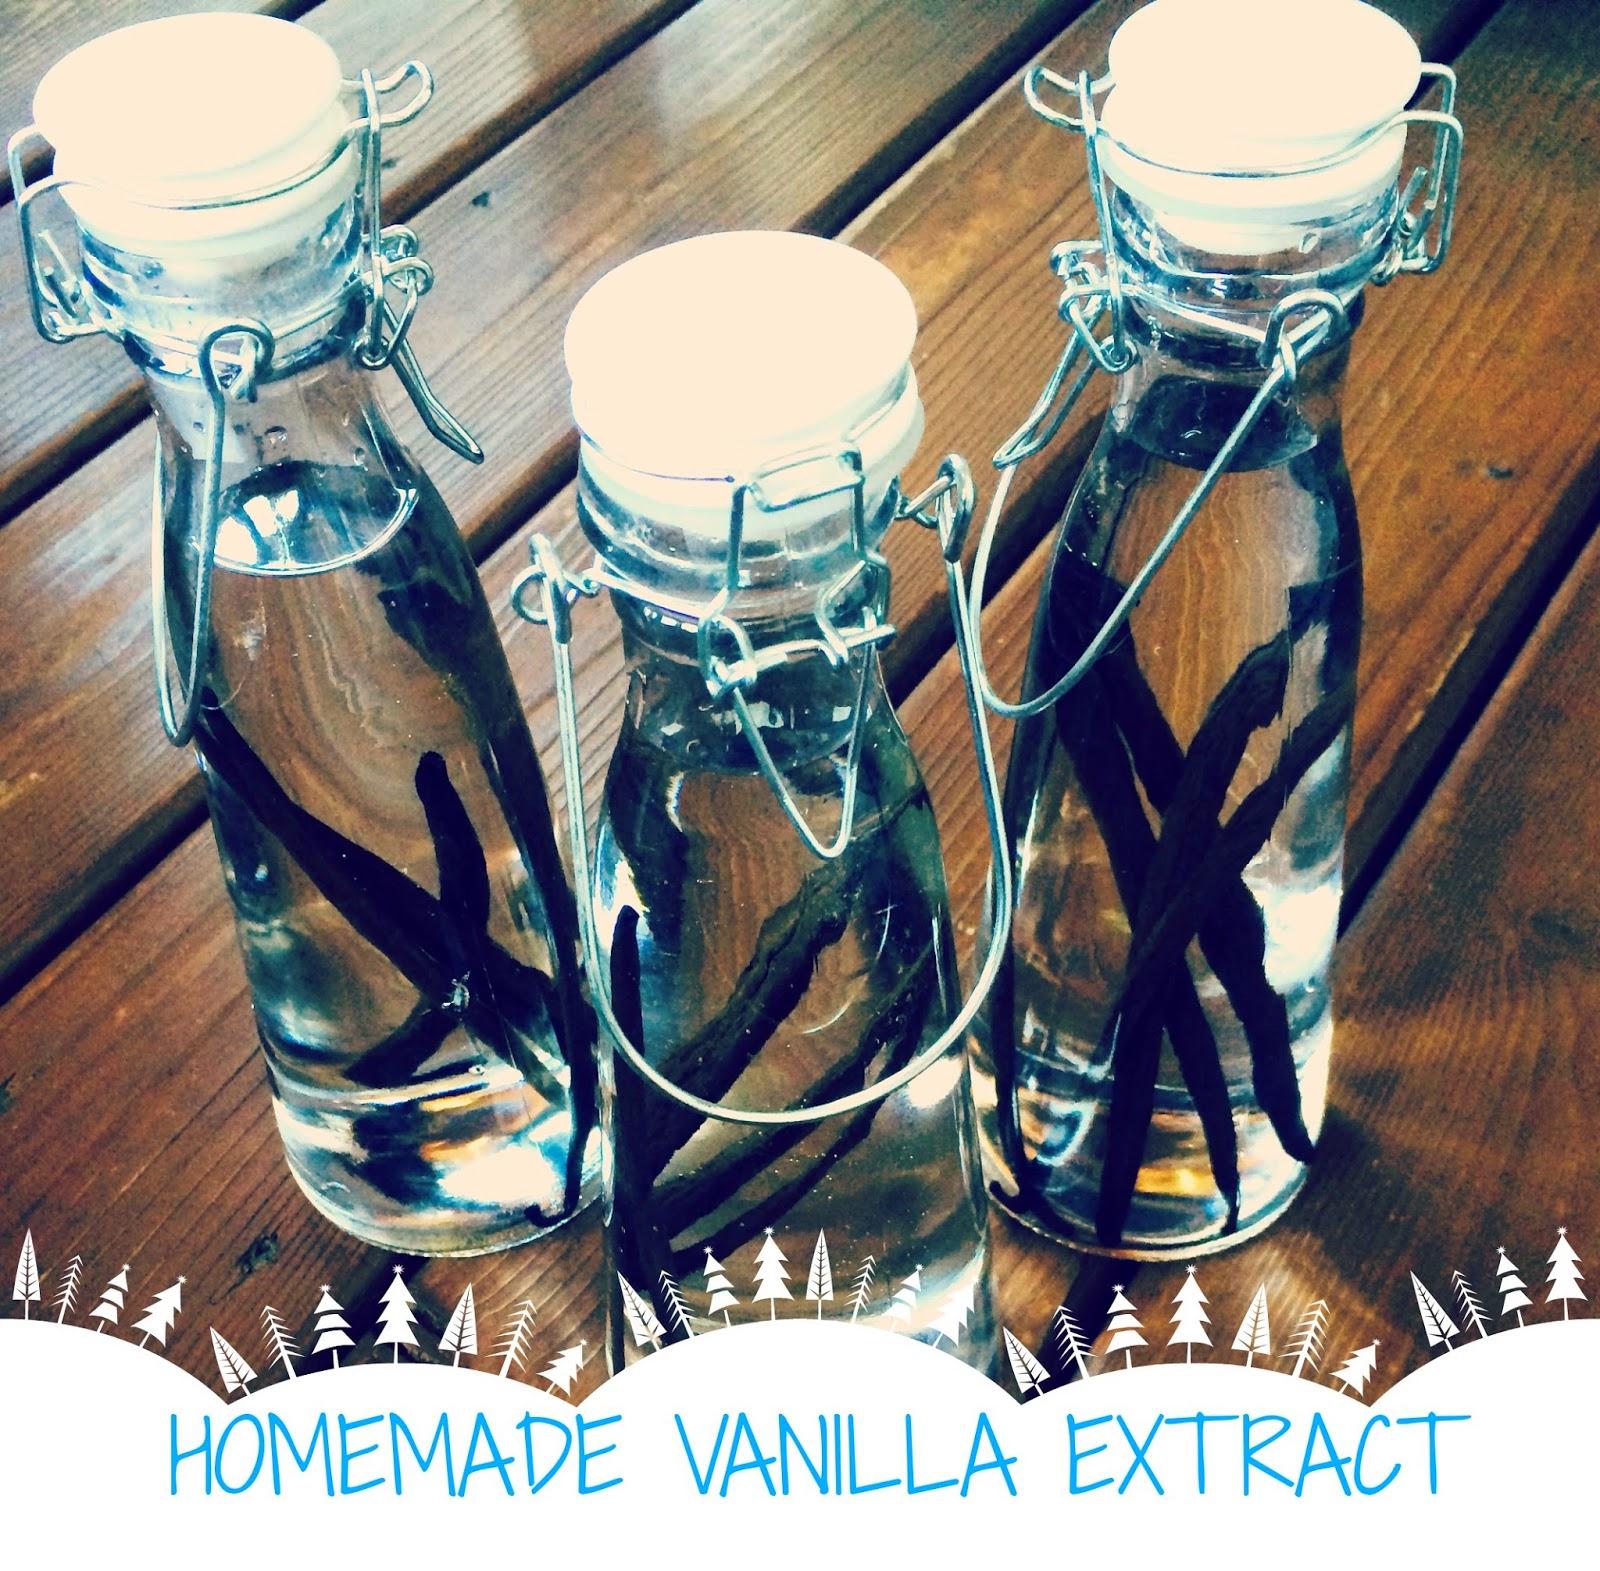 Holiday Gifts: Homemade Vanilla Extract